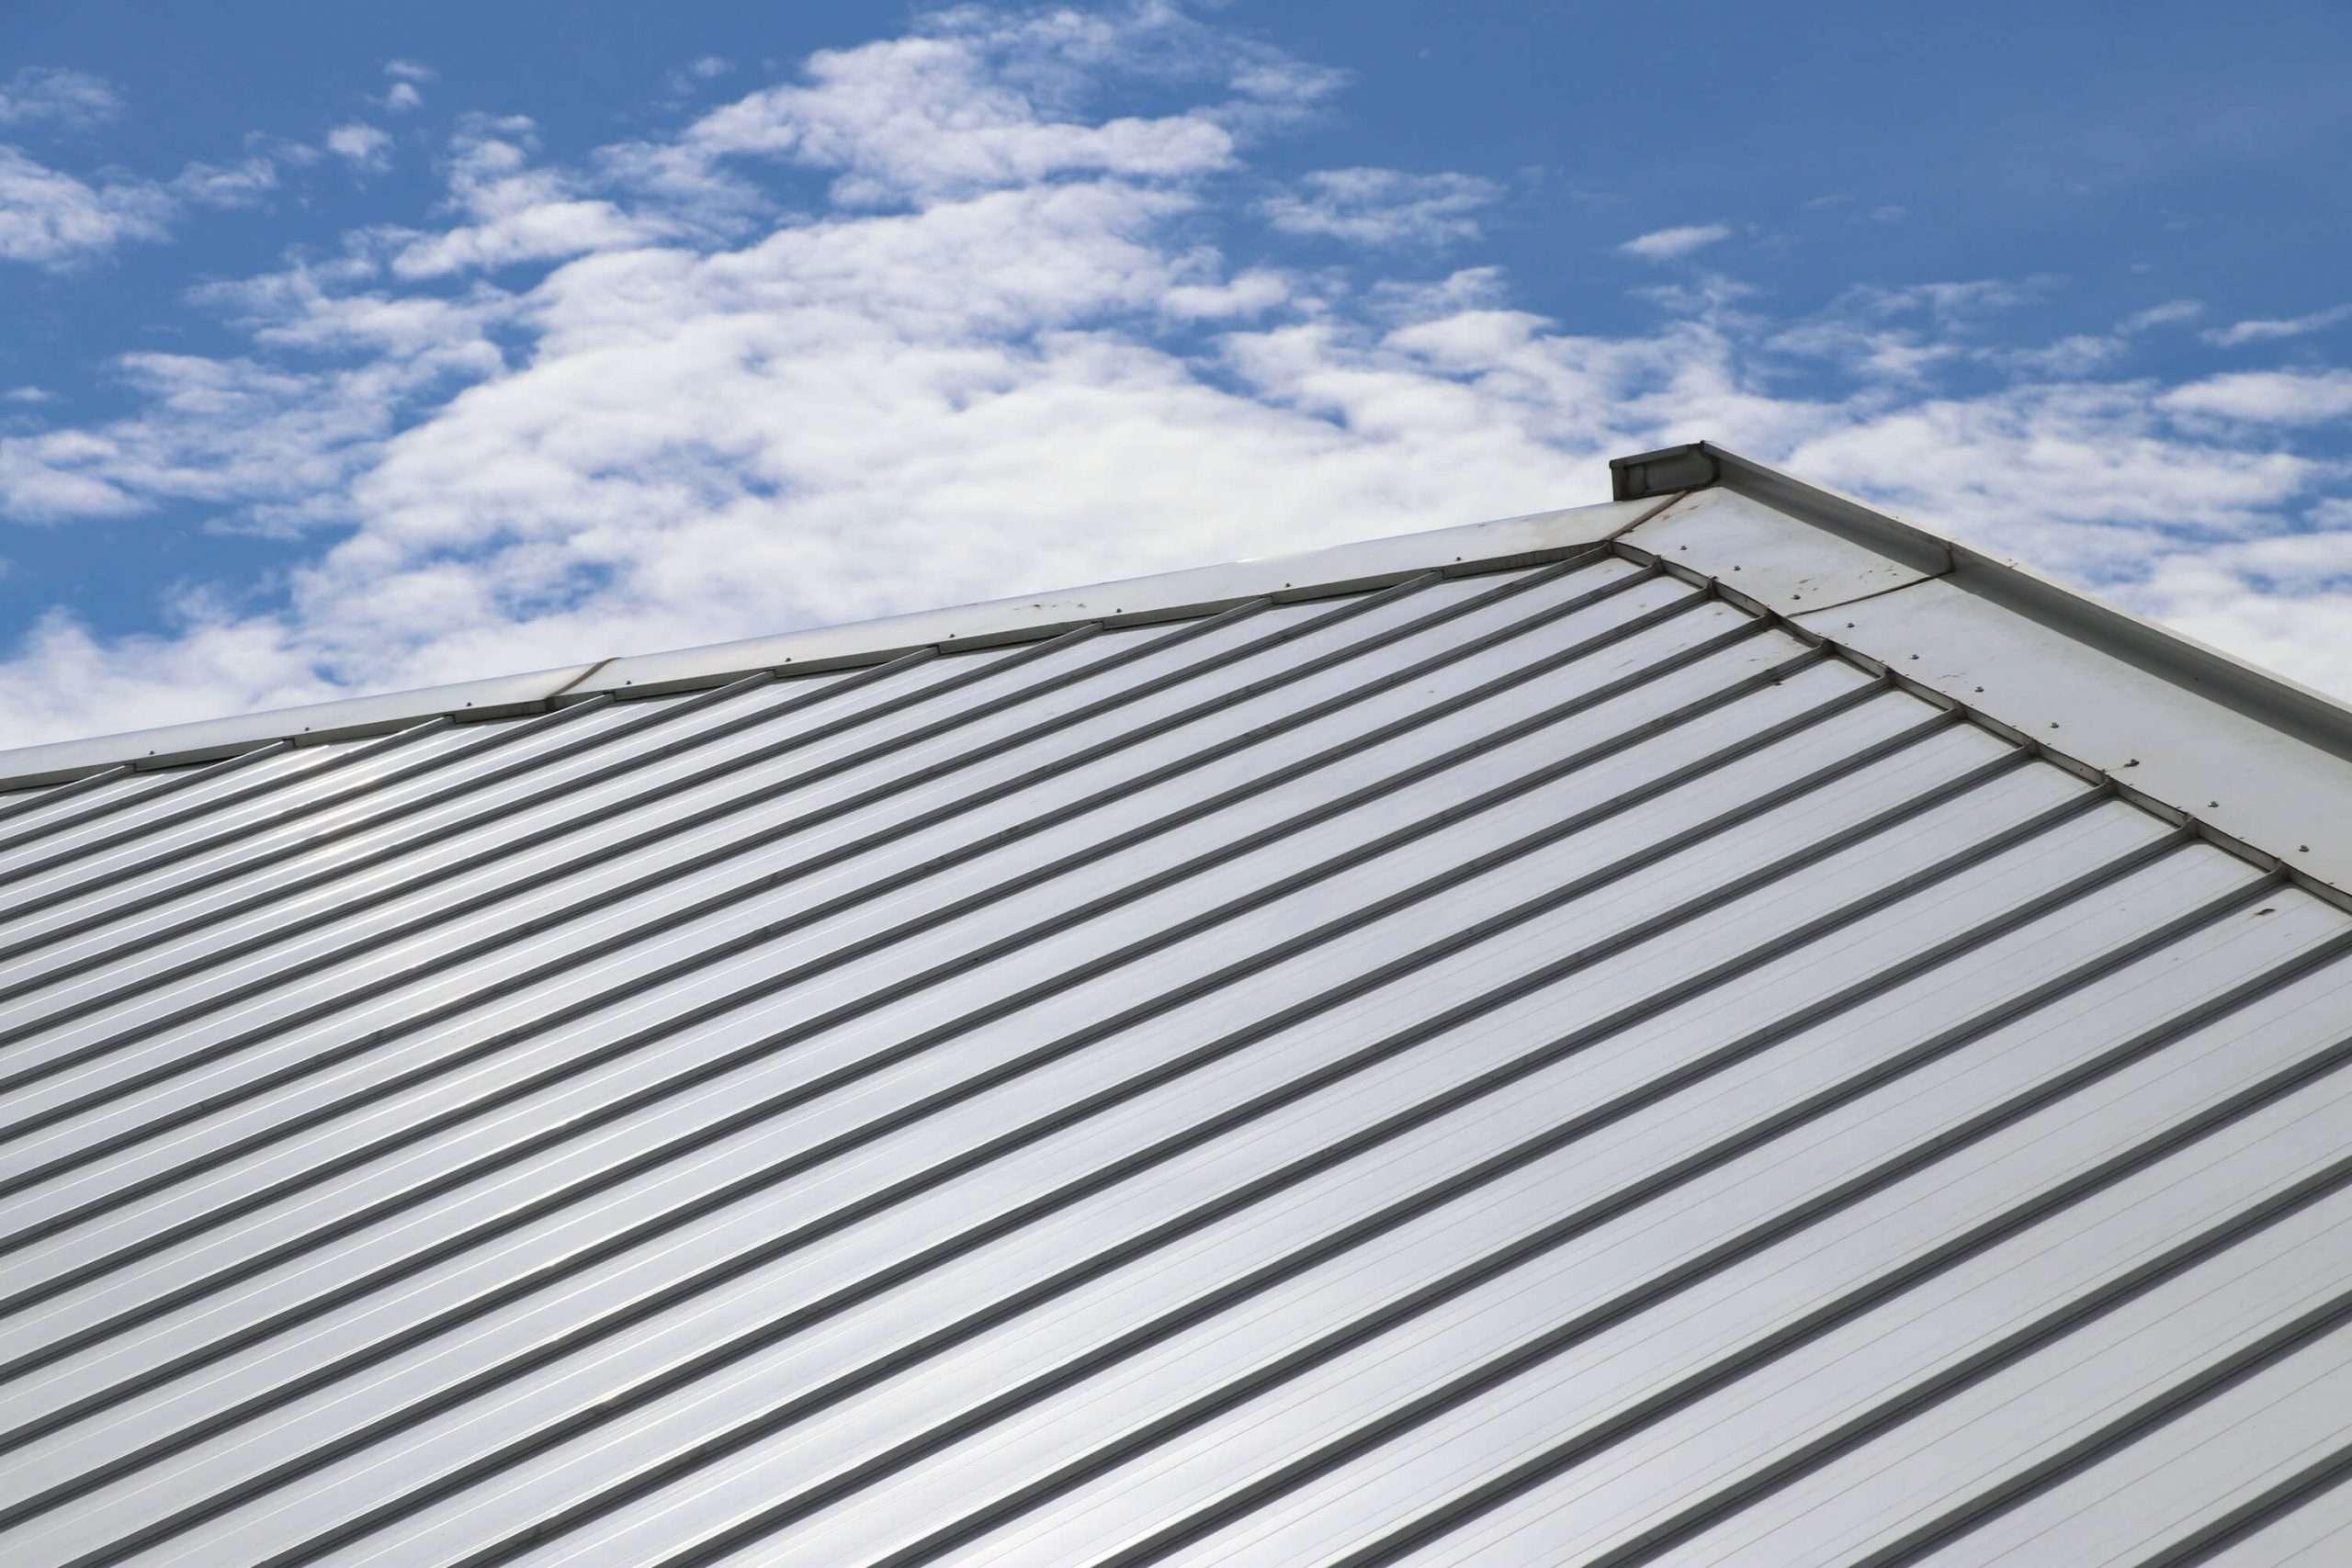 5 conseils pour entretenir sa toiture de tôle   Toitures Urbi